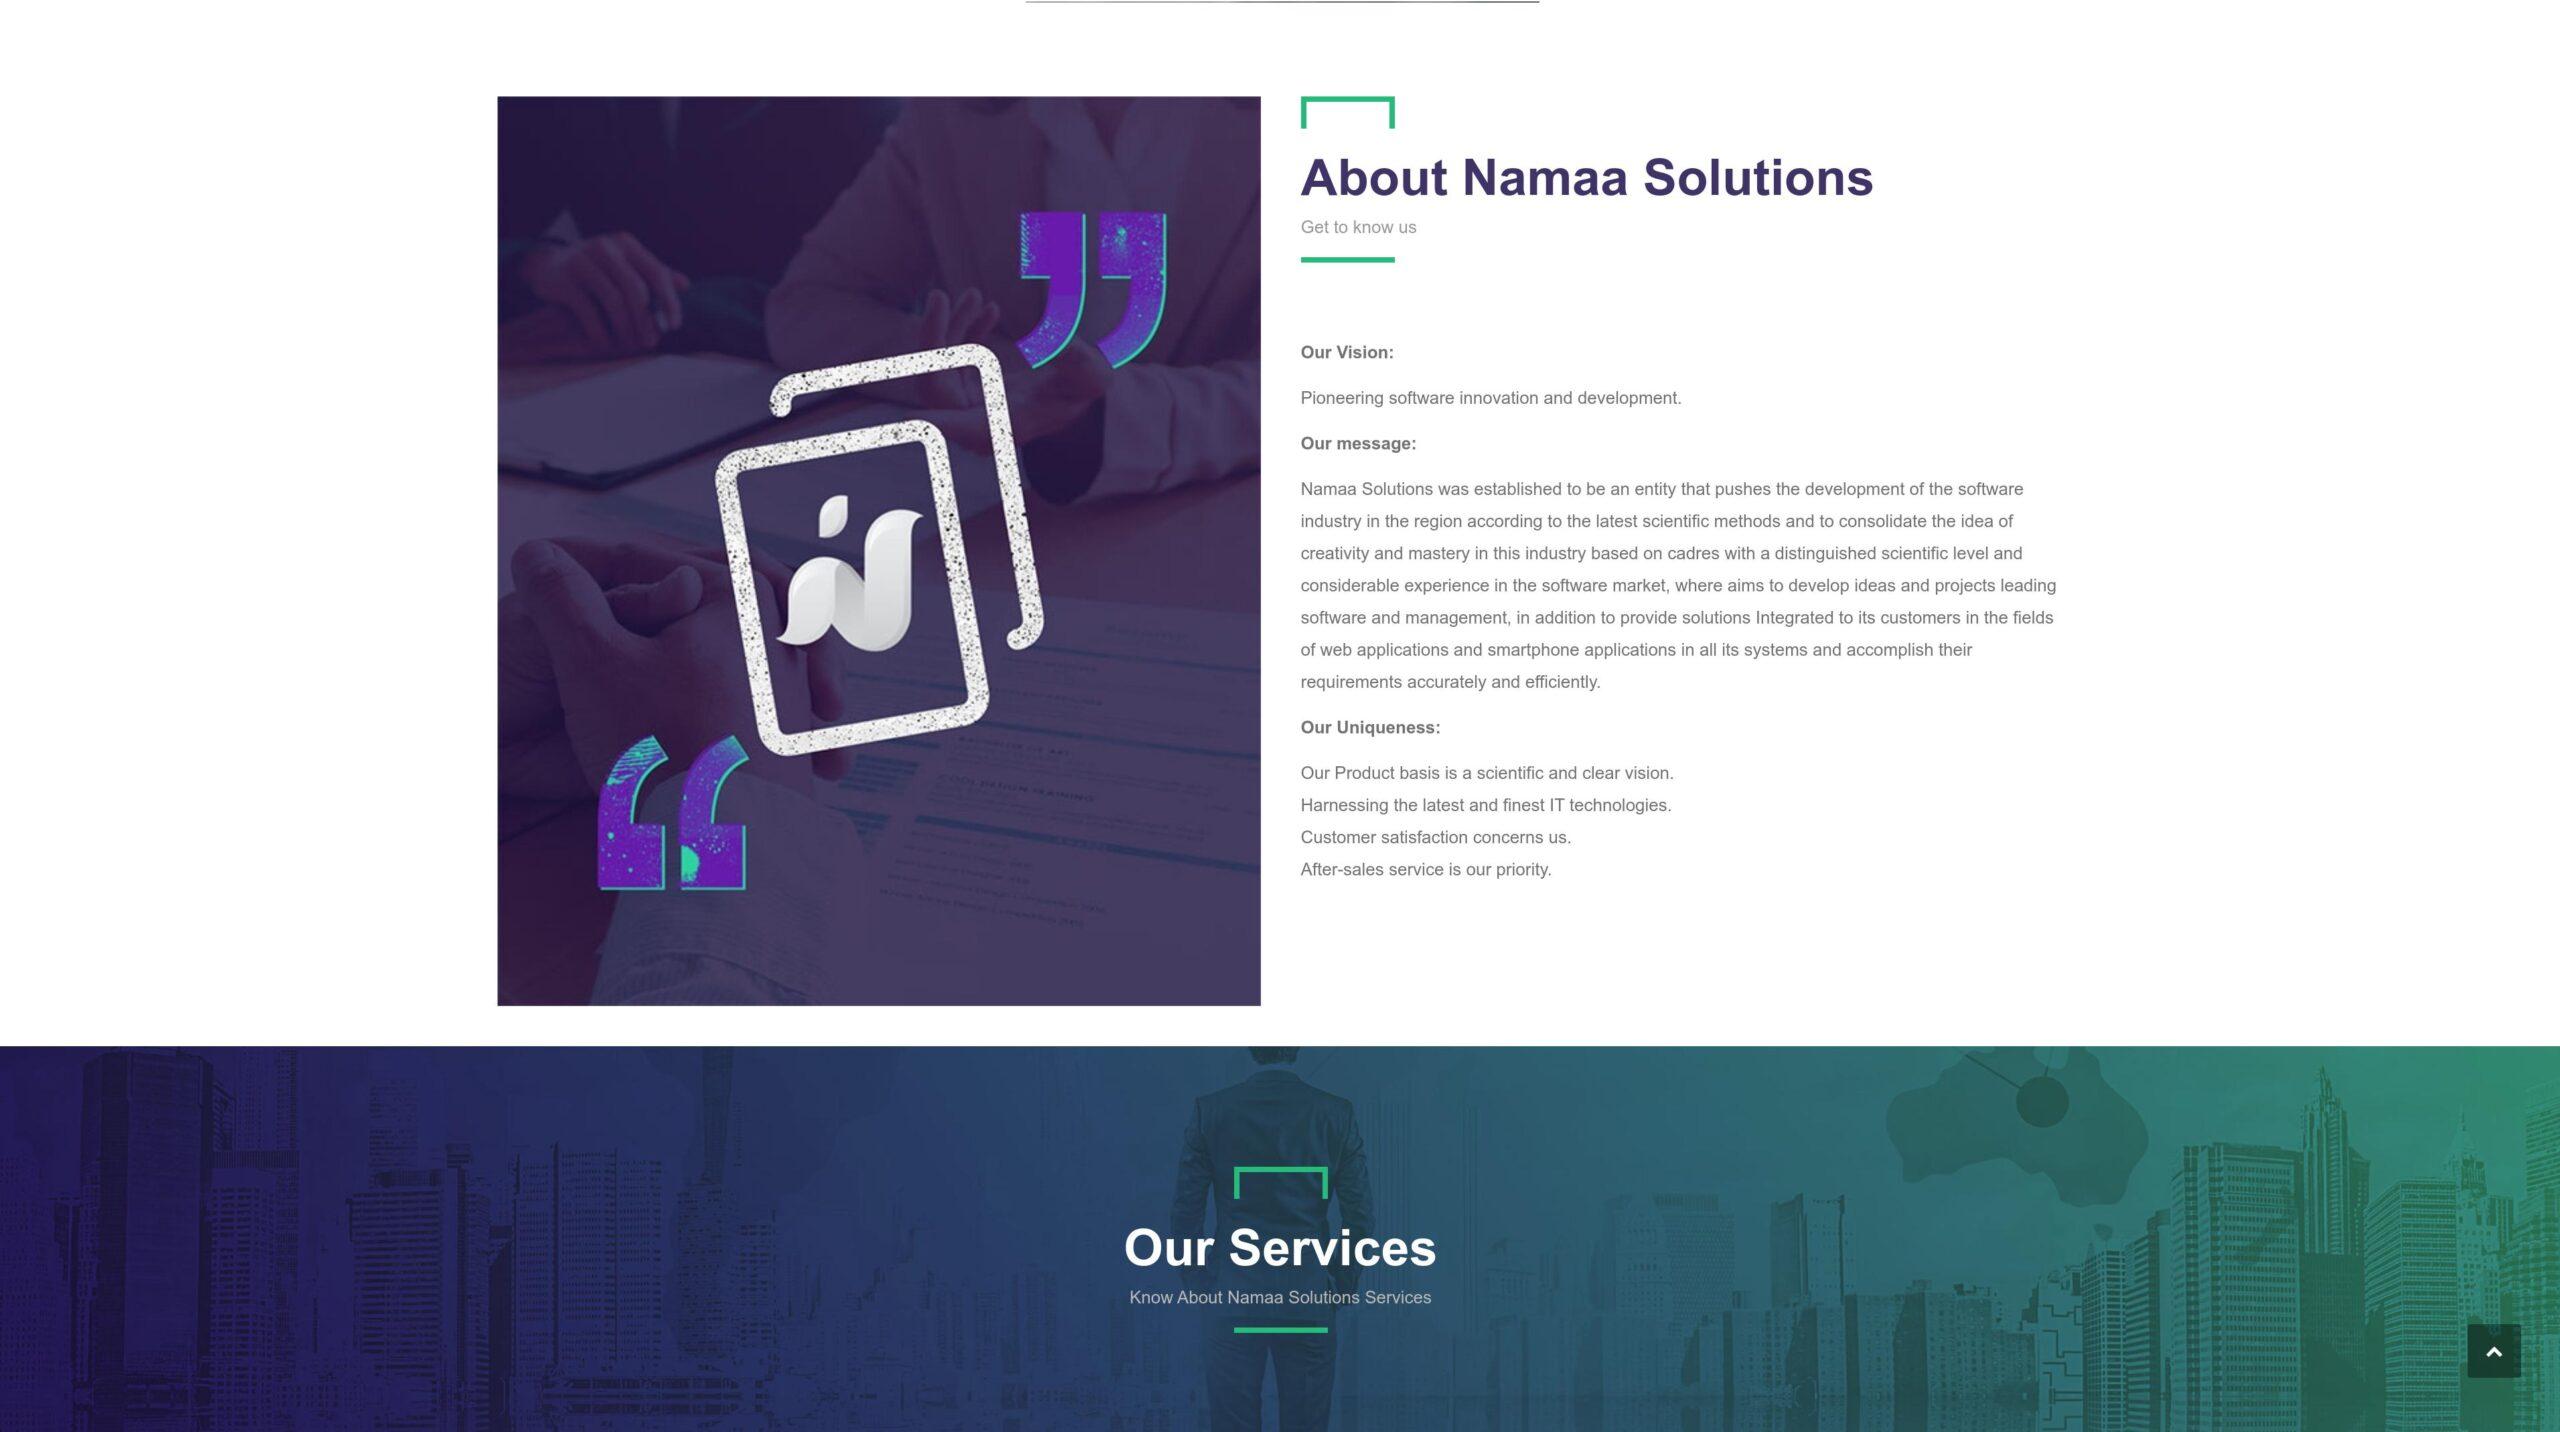 Orpetron Web Design Awards - Namaa-Solutions - Web Design Awards Inspiration Trends UI UX